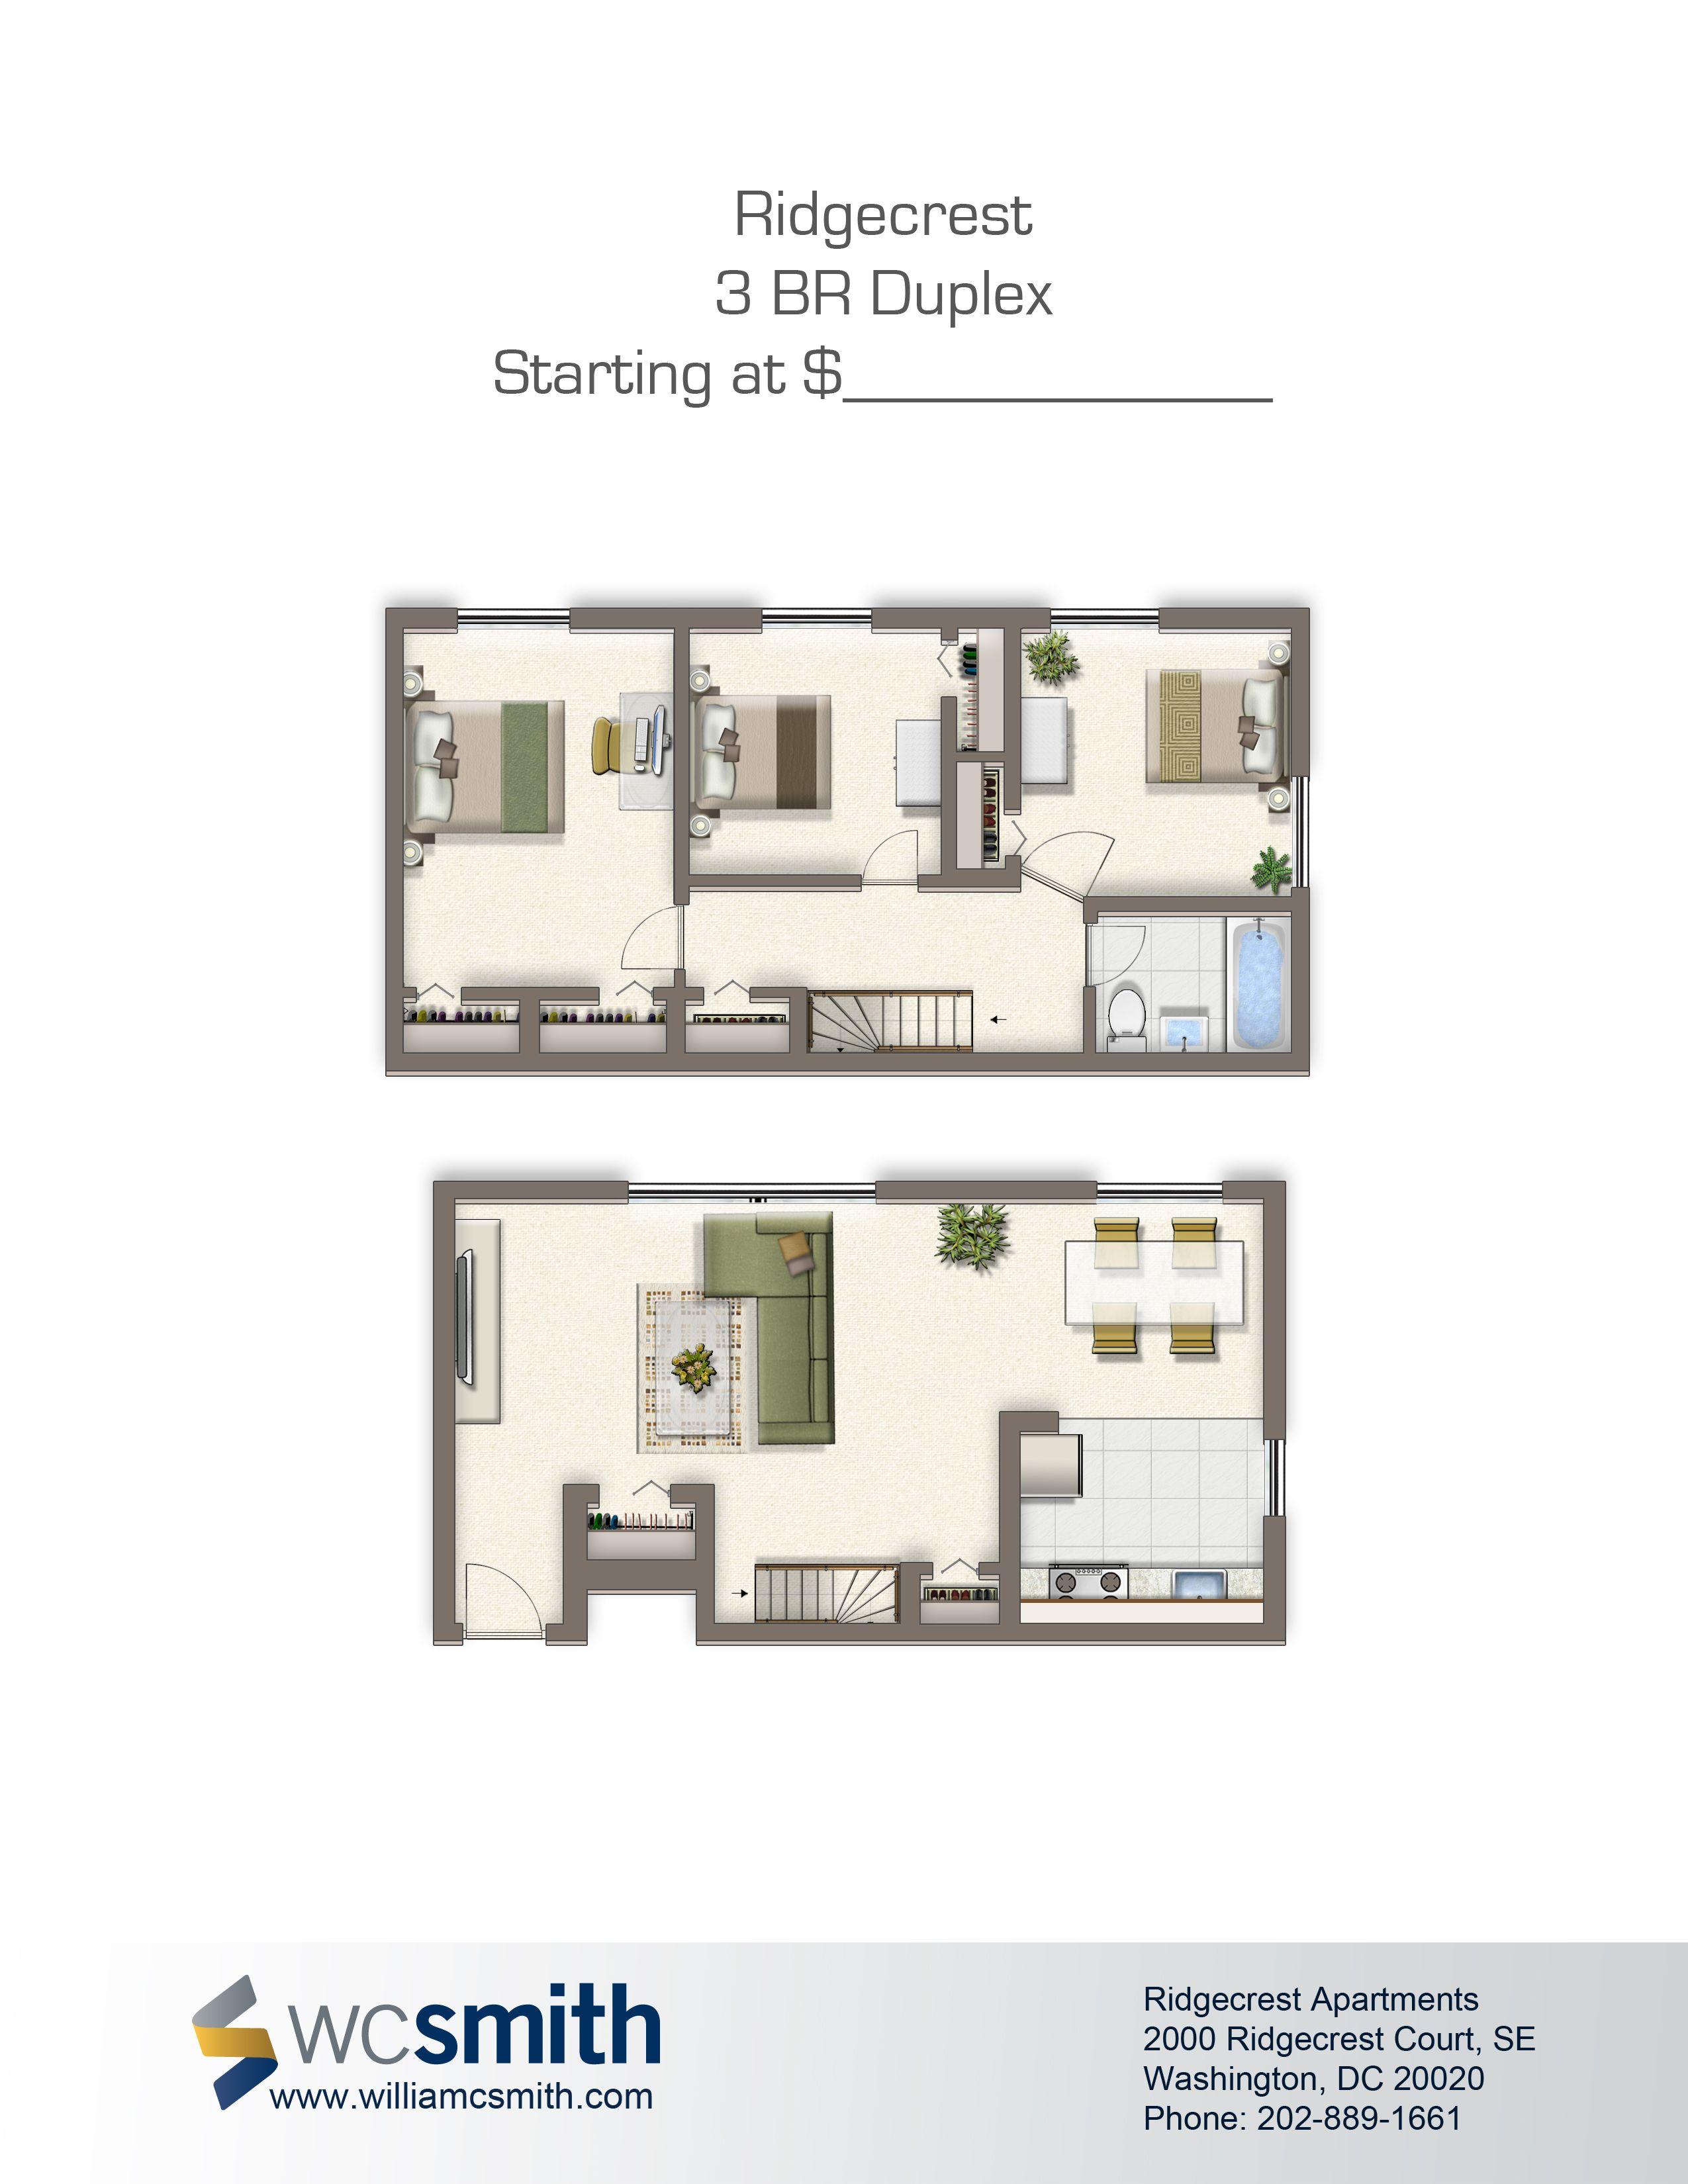 Ridgecrest Apartments Wc Smith Stylish Apartment Bedroom Floor Plans Apartment